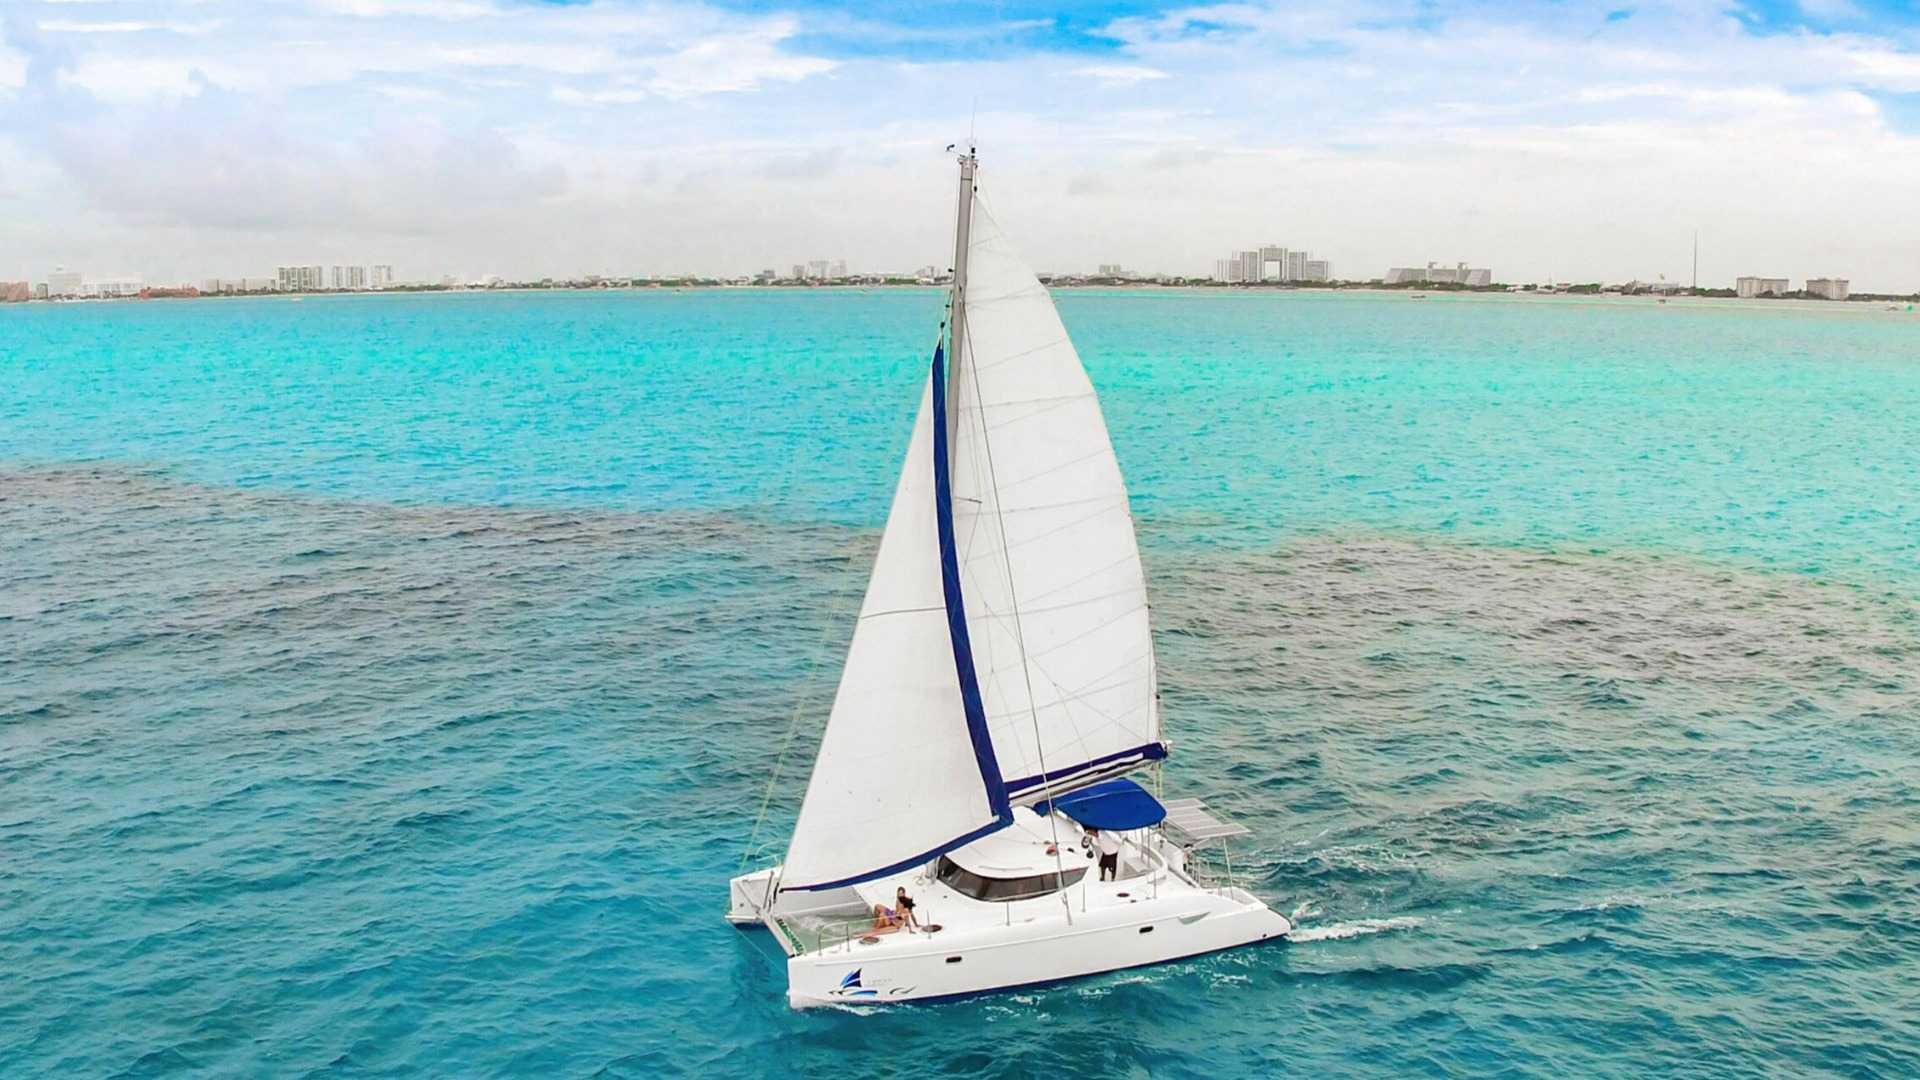 3 - LowRes - Malube - Isla Mujeres Catamaran Tour - Cancun Sailing